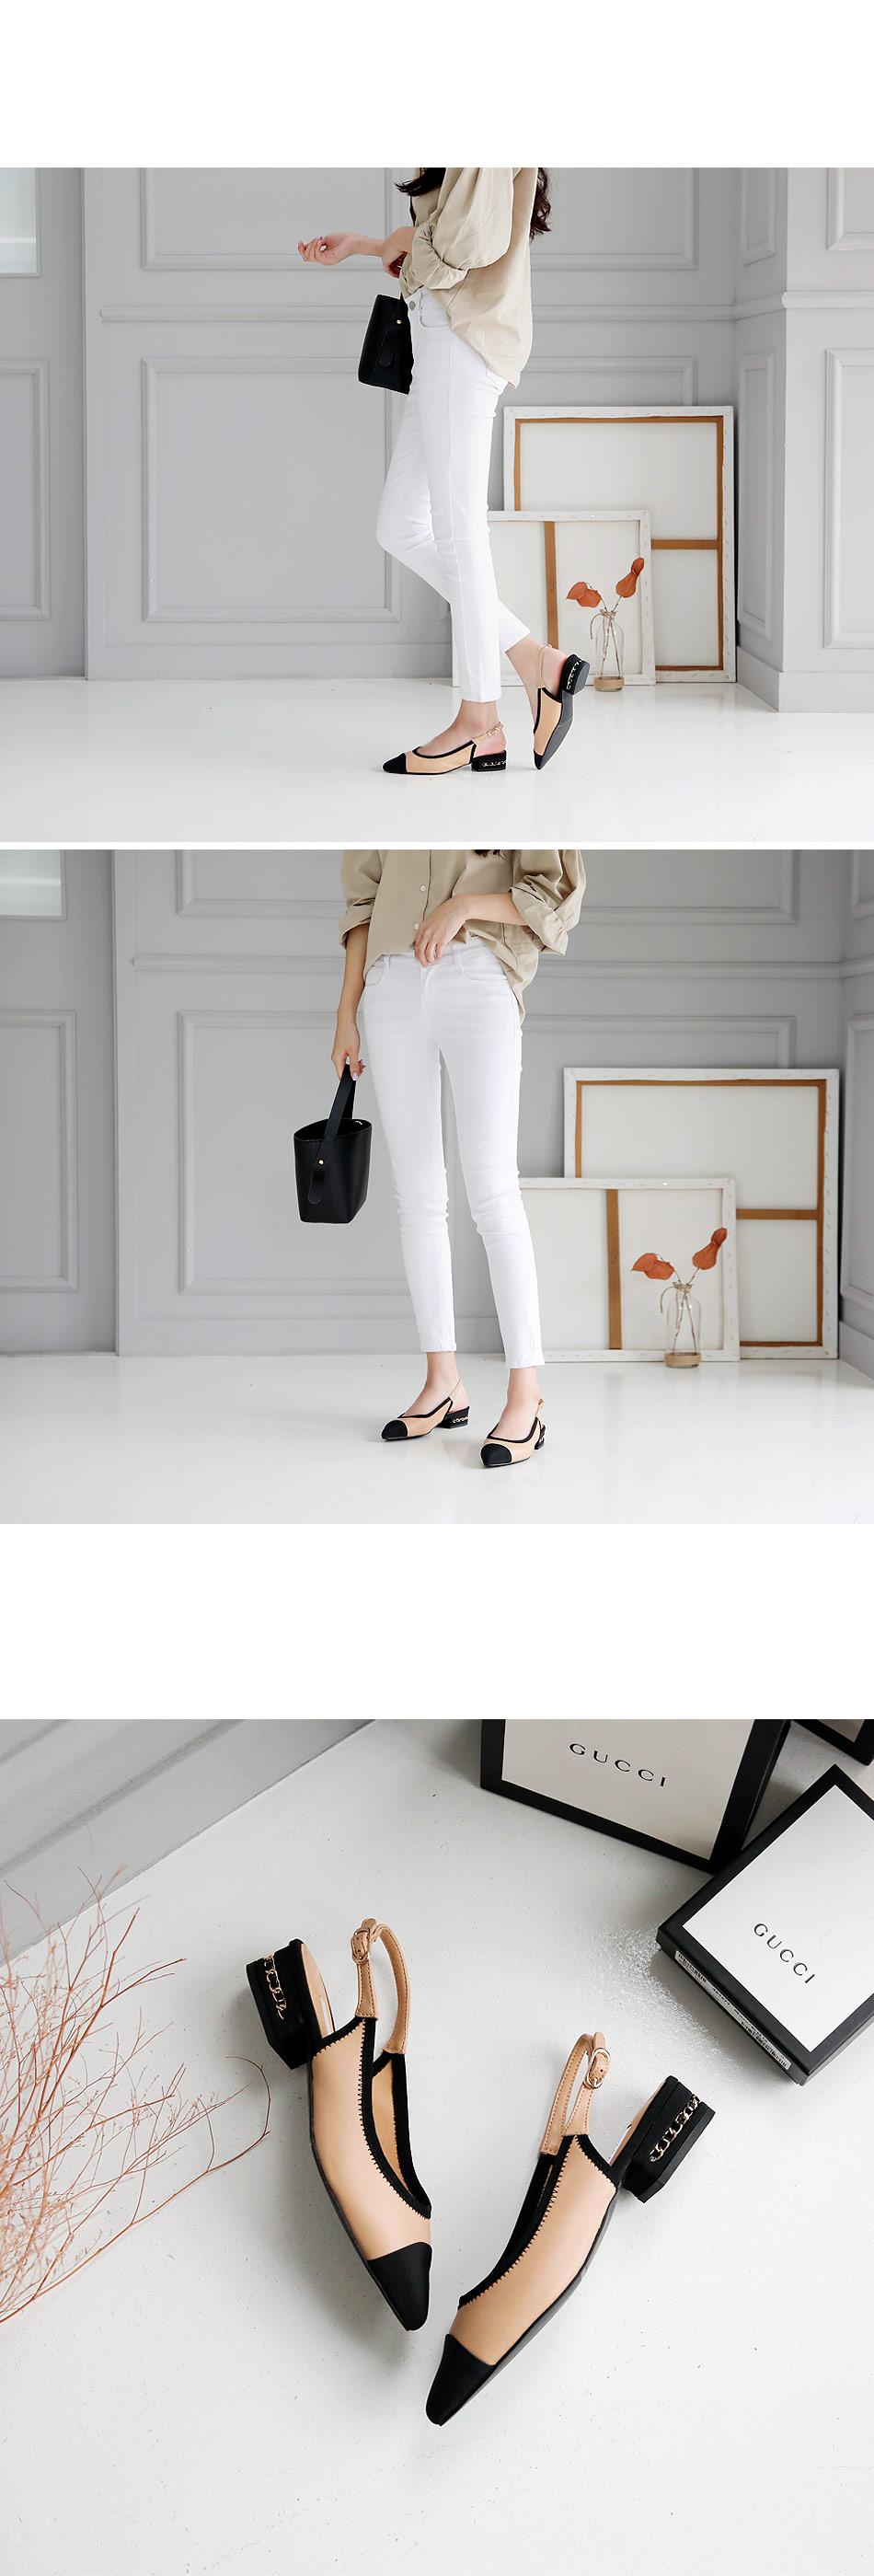 Charlene Slingback Flat Shoes 3cm